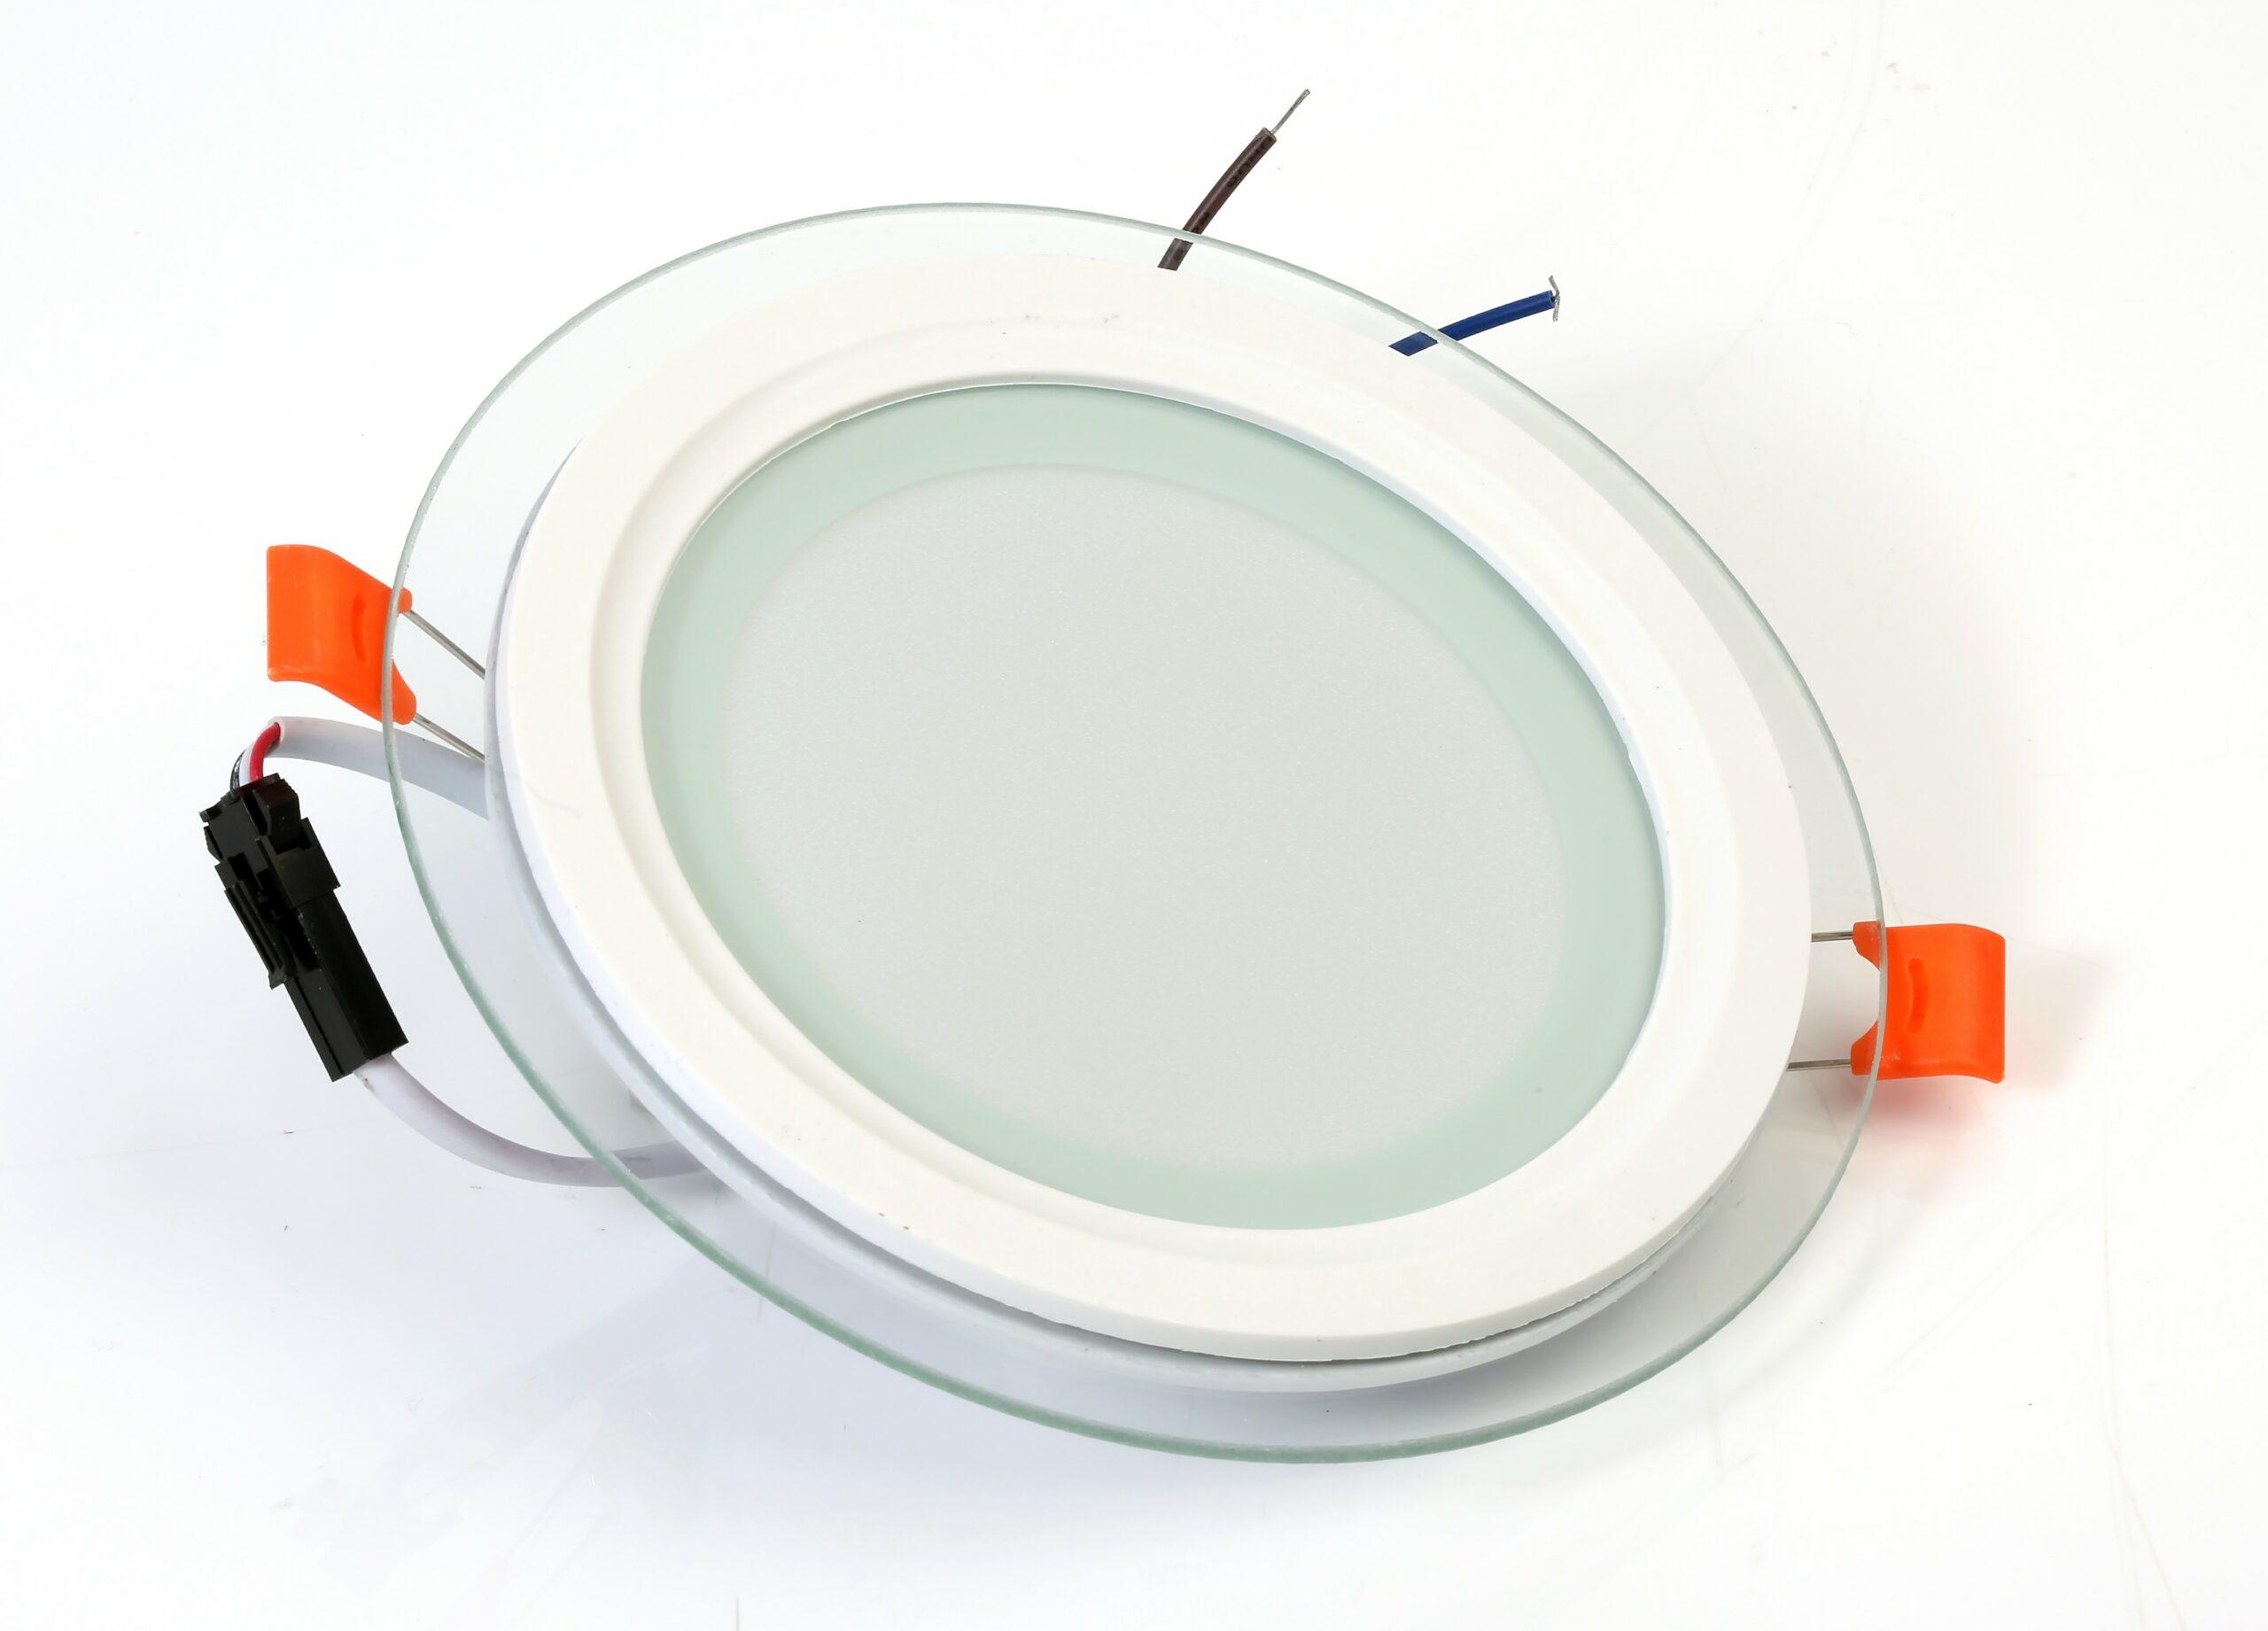 12W LED GLASS PANEL 3 COLOR CHANGE